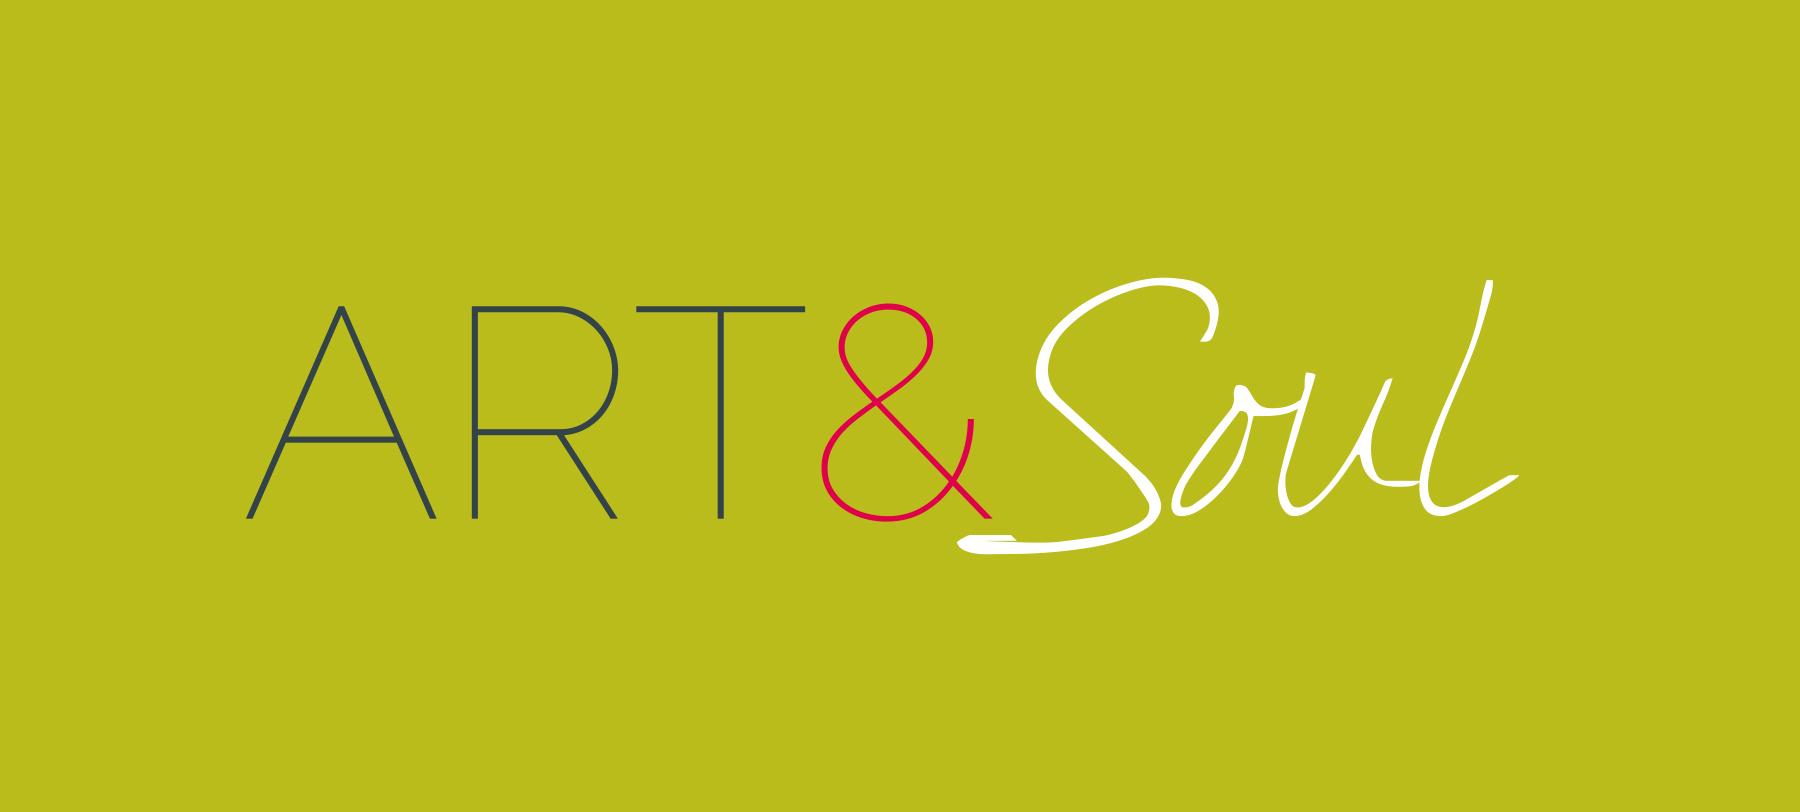 Dart Design | Branding, corporate marketing and graphic design